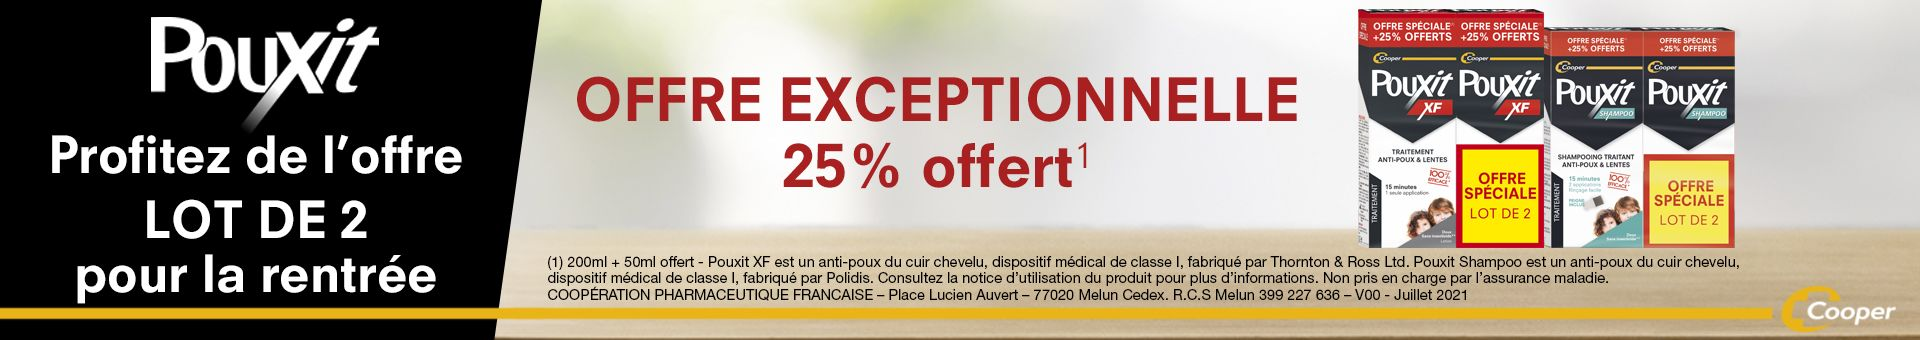 Pharmacie Internationale,Nice